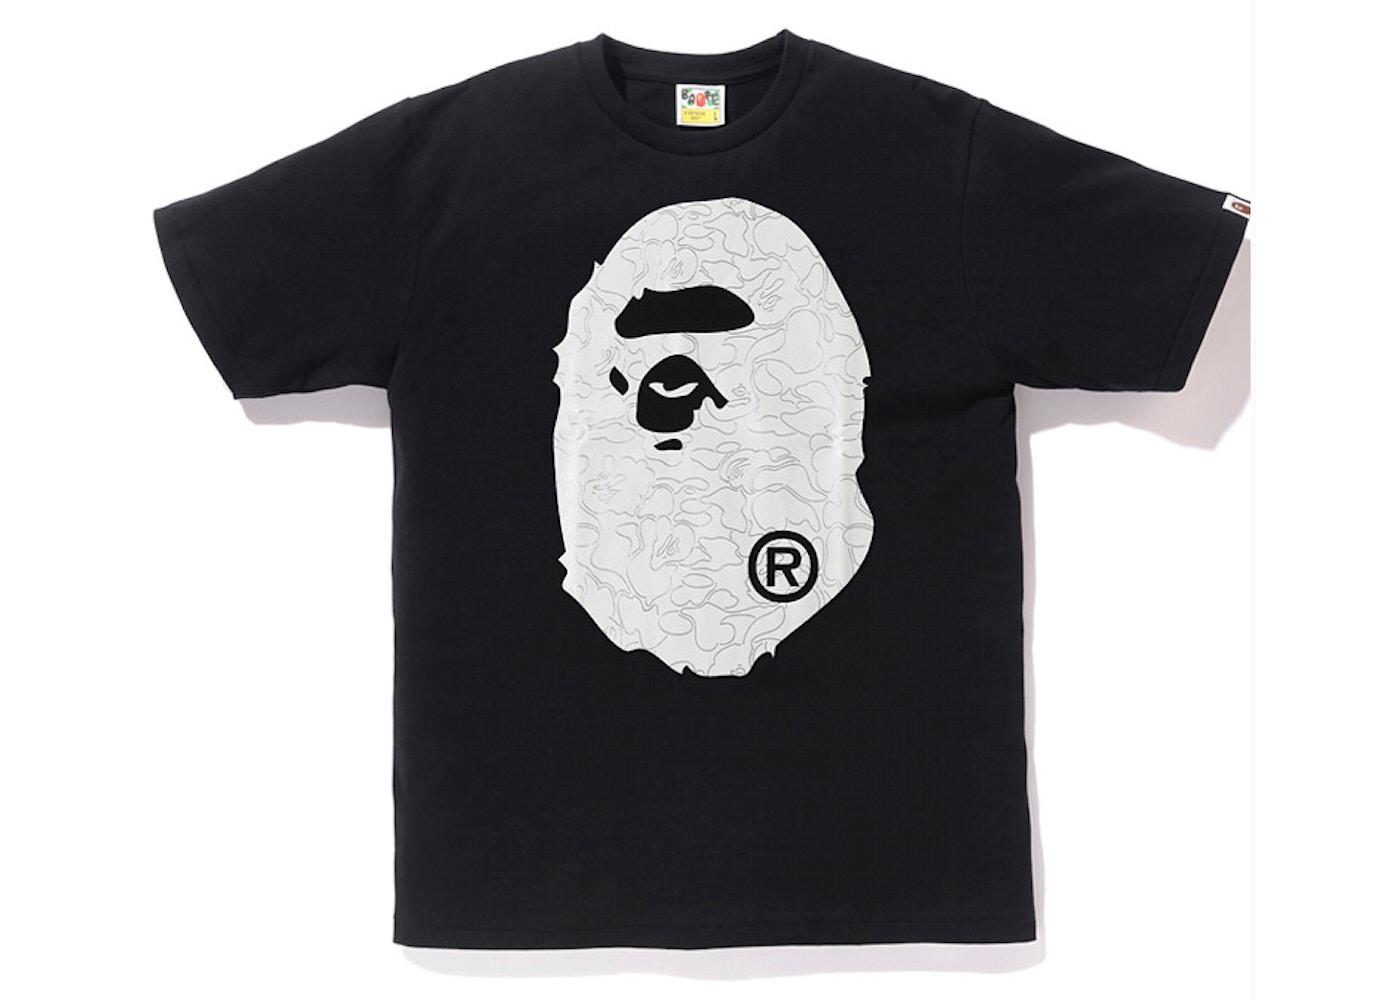 ff01423d Sell. or Ask. Size: XXL. View All Bids. BAPE Foil Neon Camo Big Ape Head Tee  Black/Gold